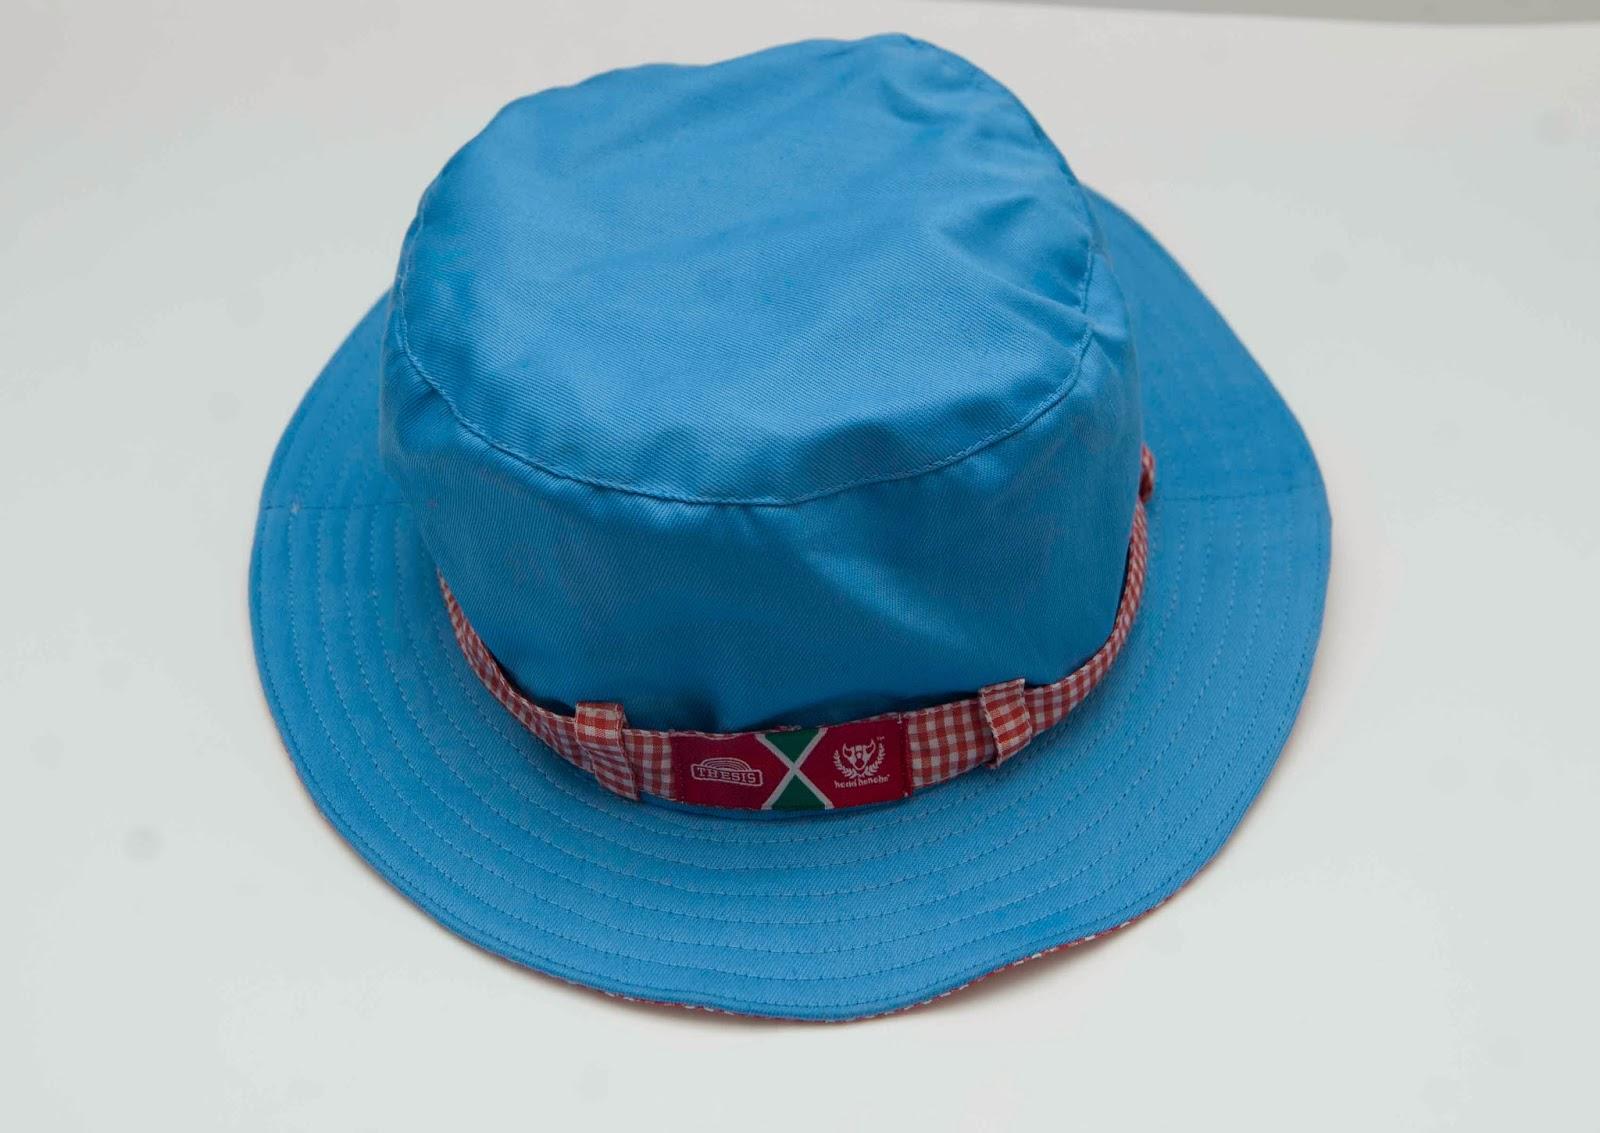 2fa391bbc62ecb Thesis bucket hat price